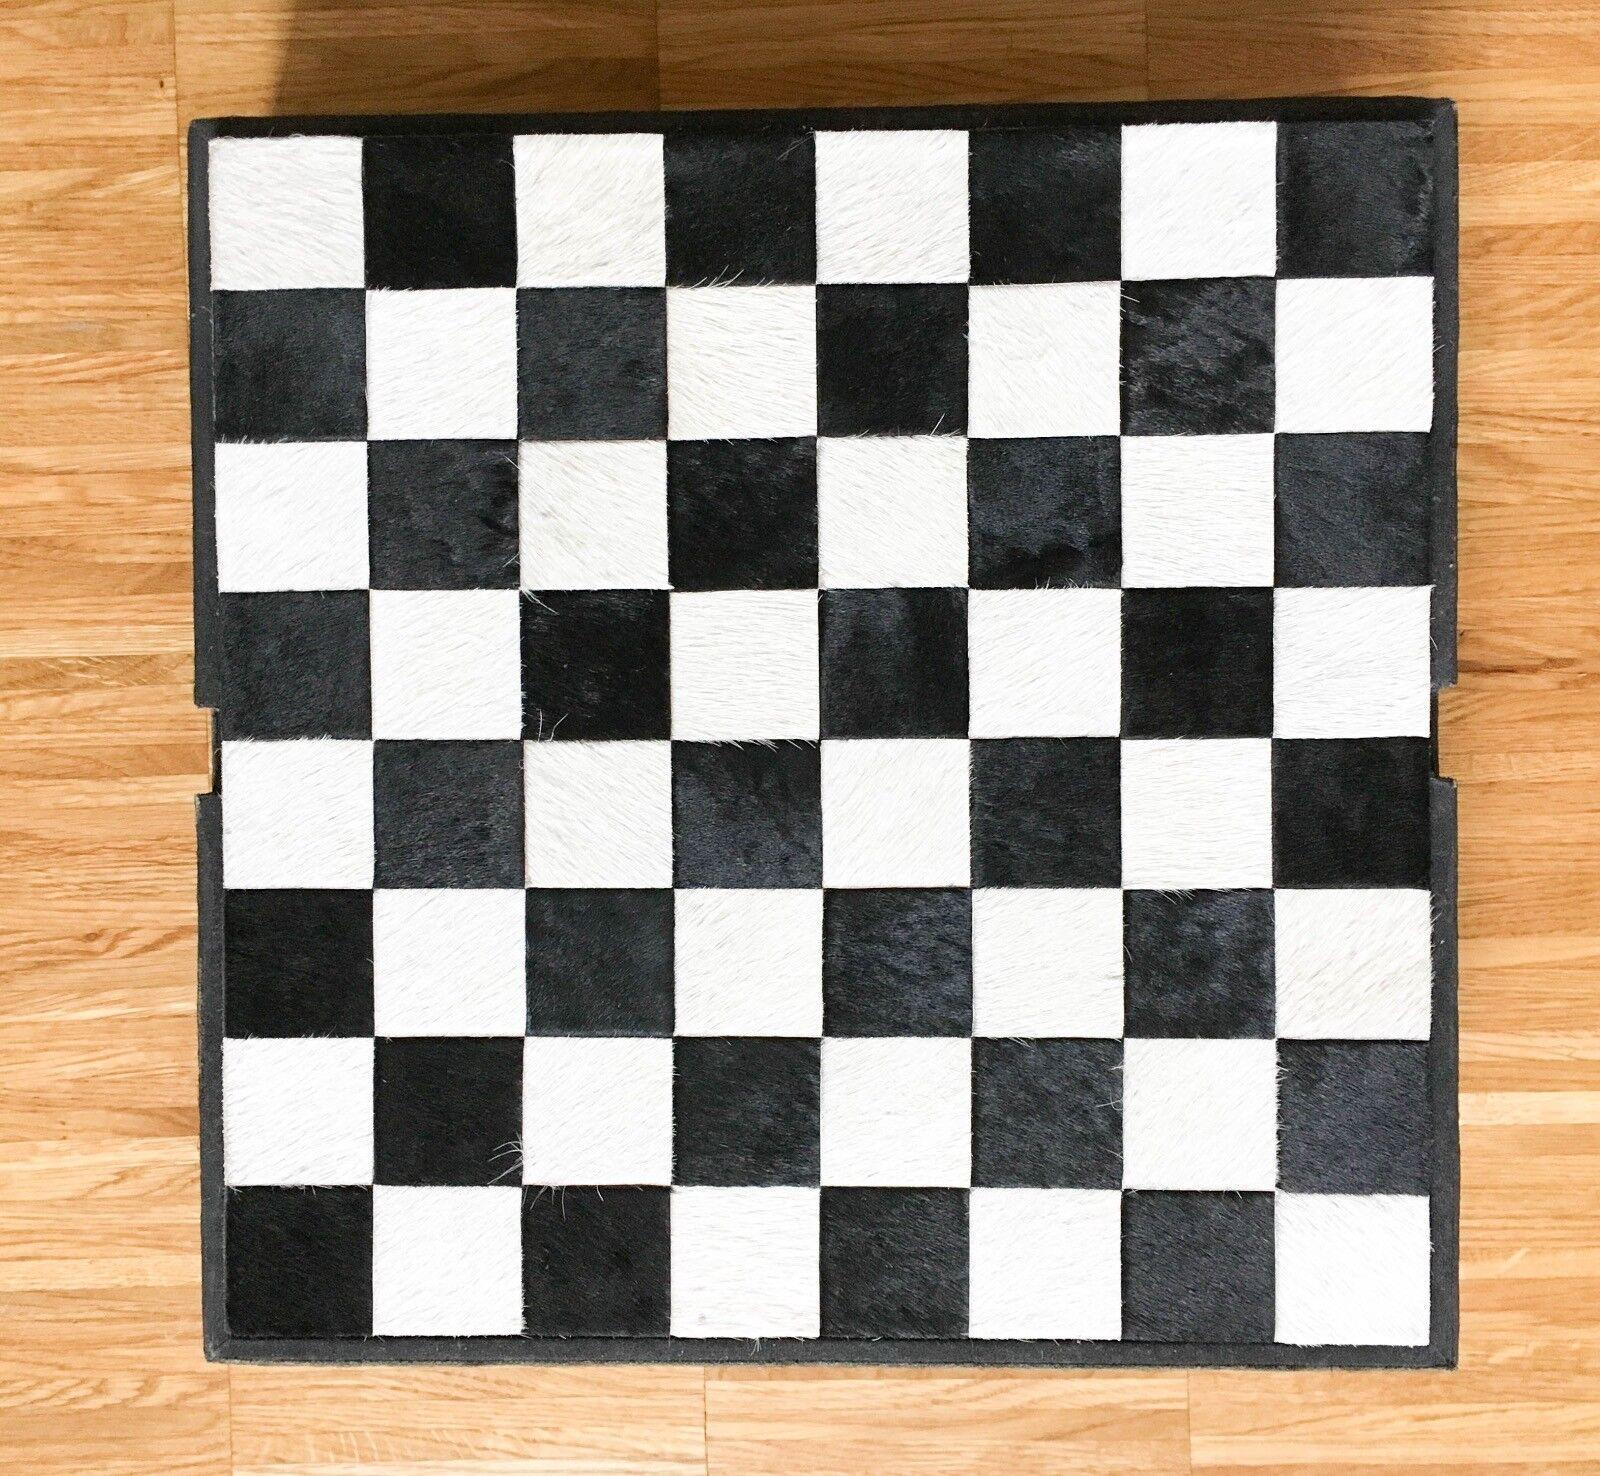 Schachspiel Backgammon Kuhfell   Leder Vintage-Look